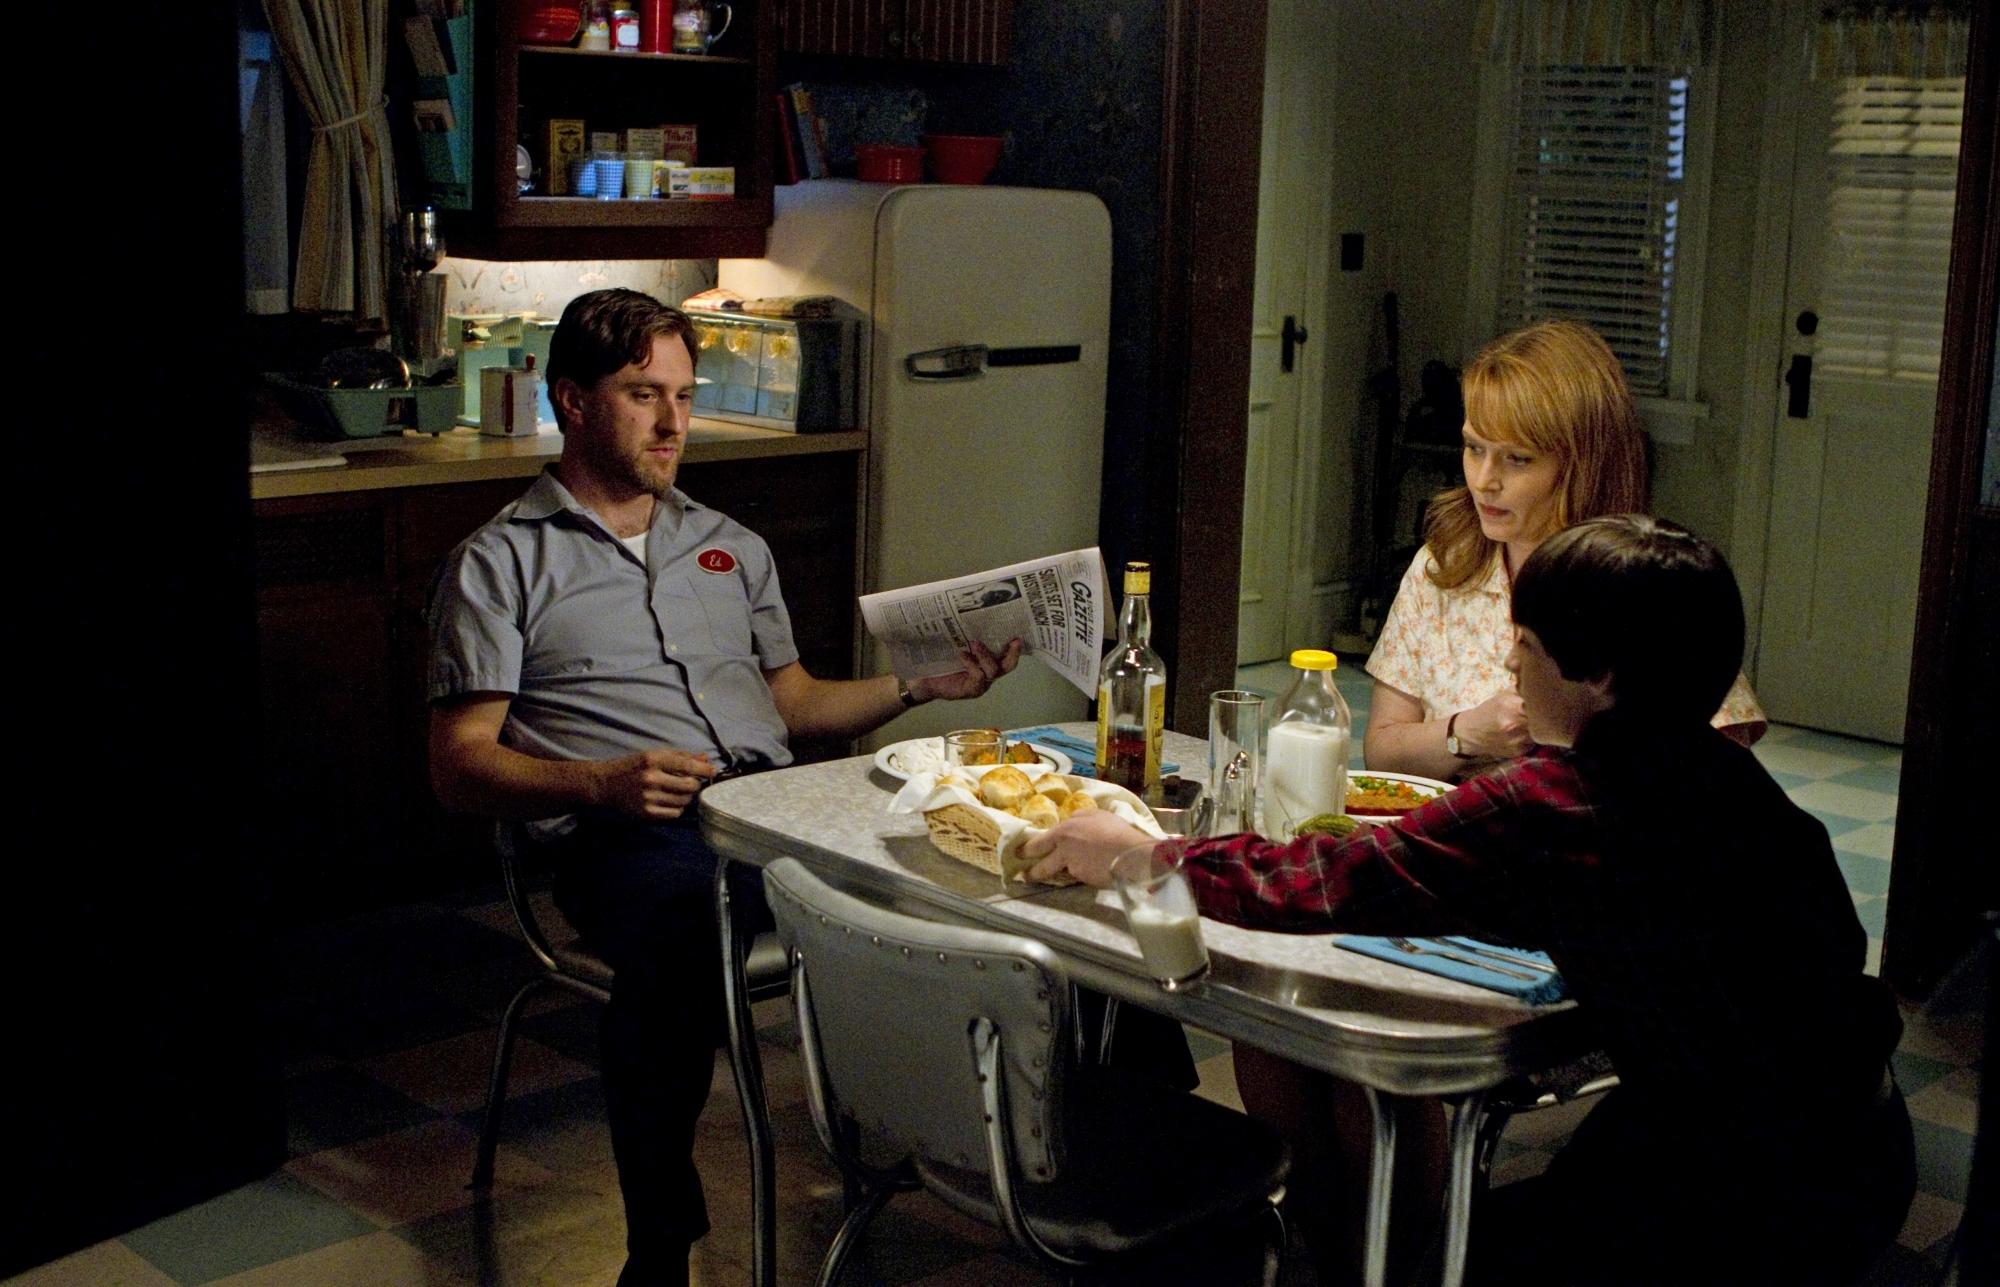 Chelah Horsdal, Edward Foy, and Collin MacKechnie in Supernatural (2005)